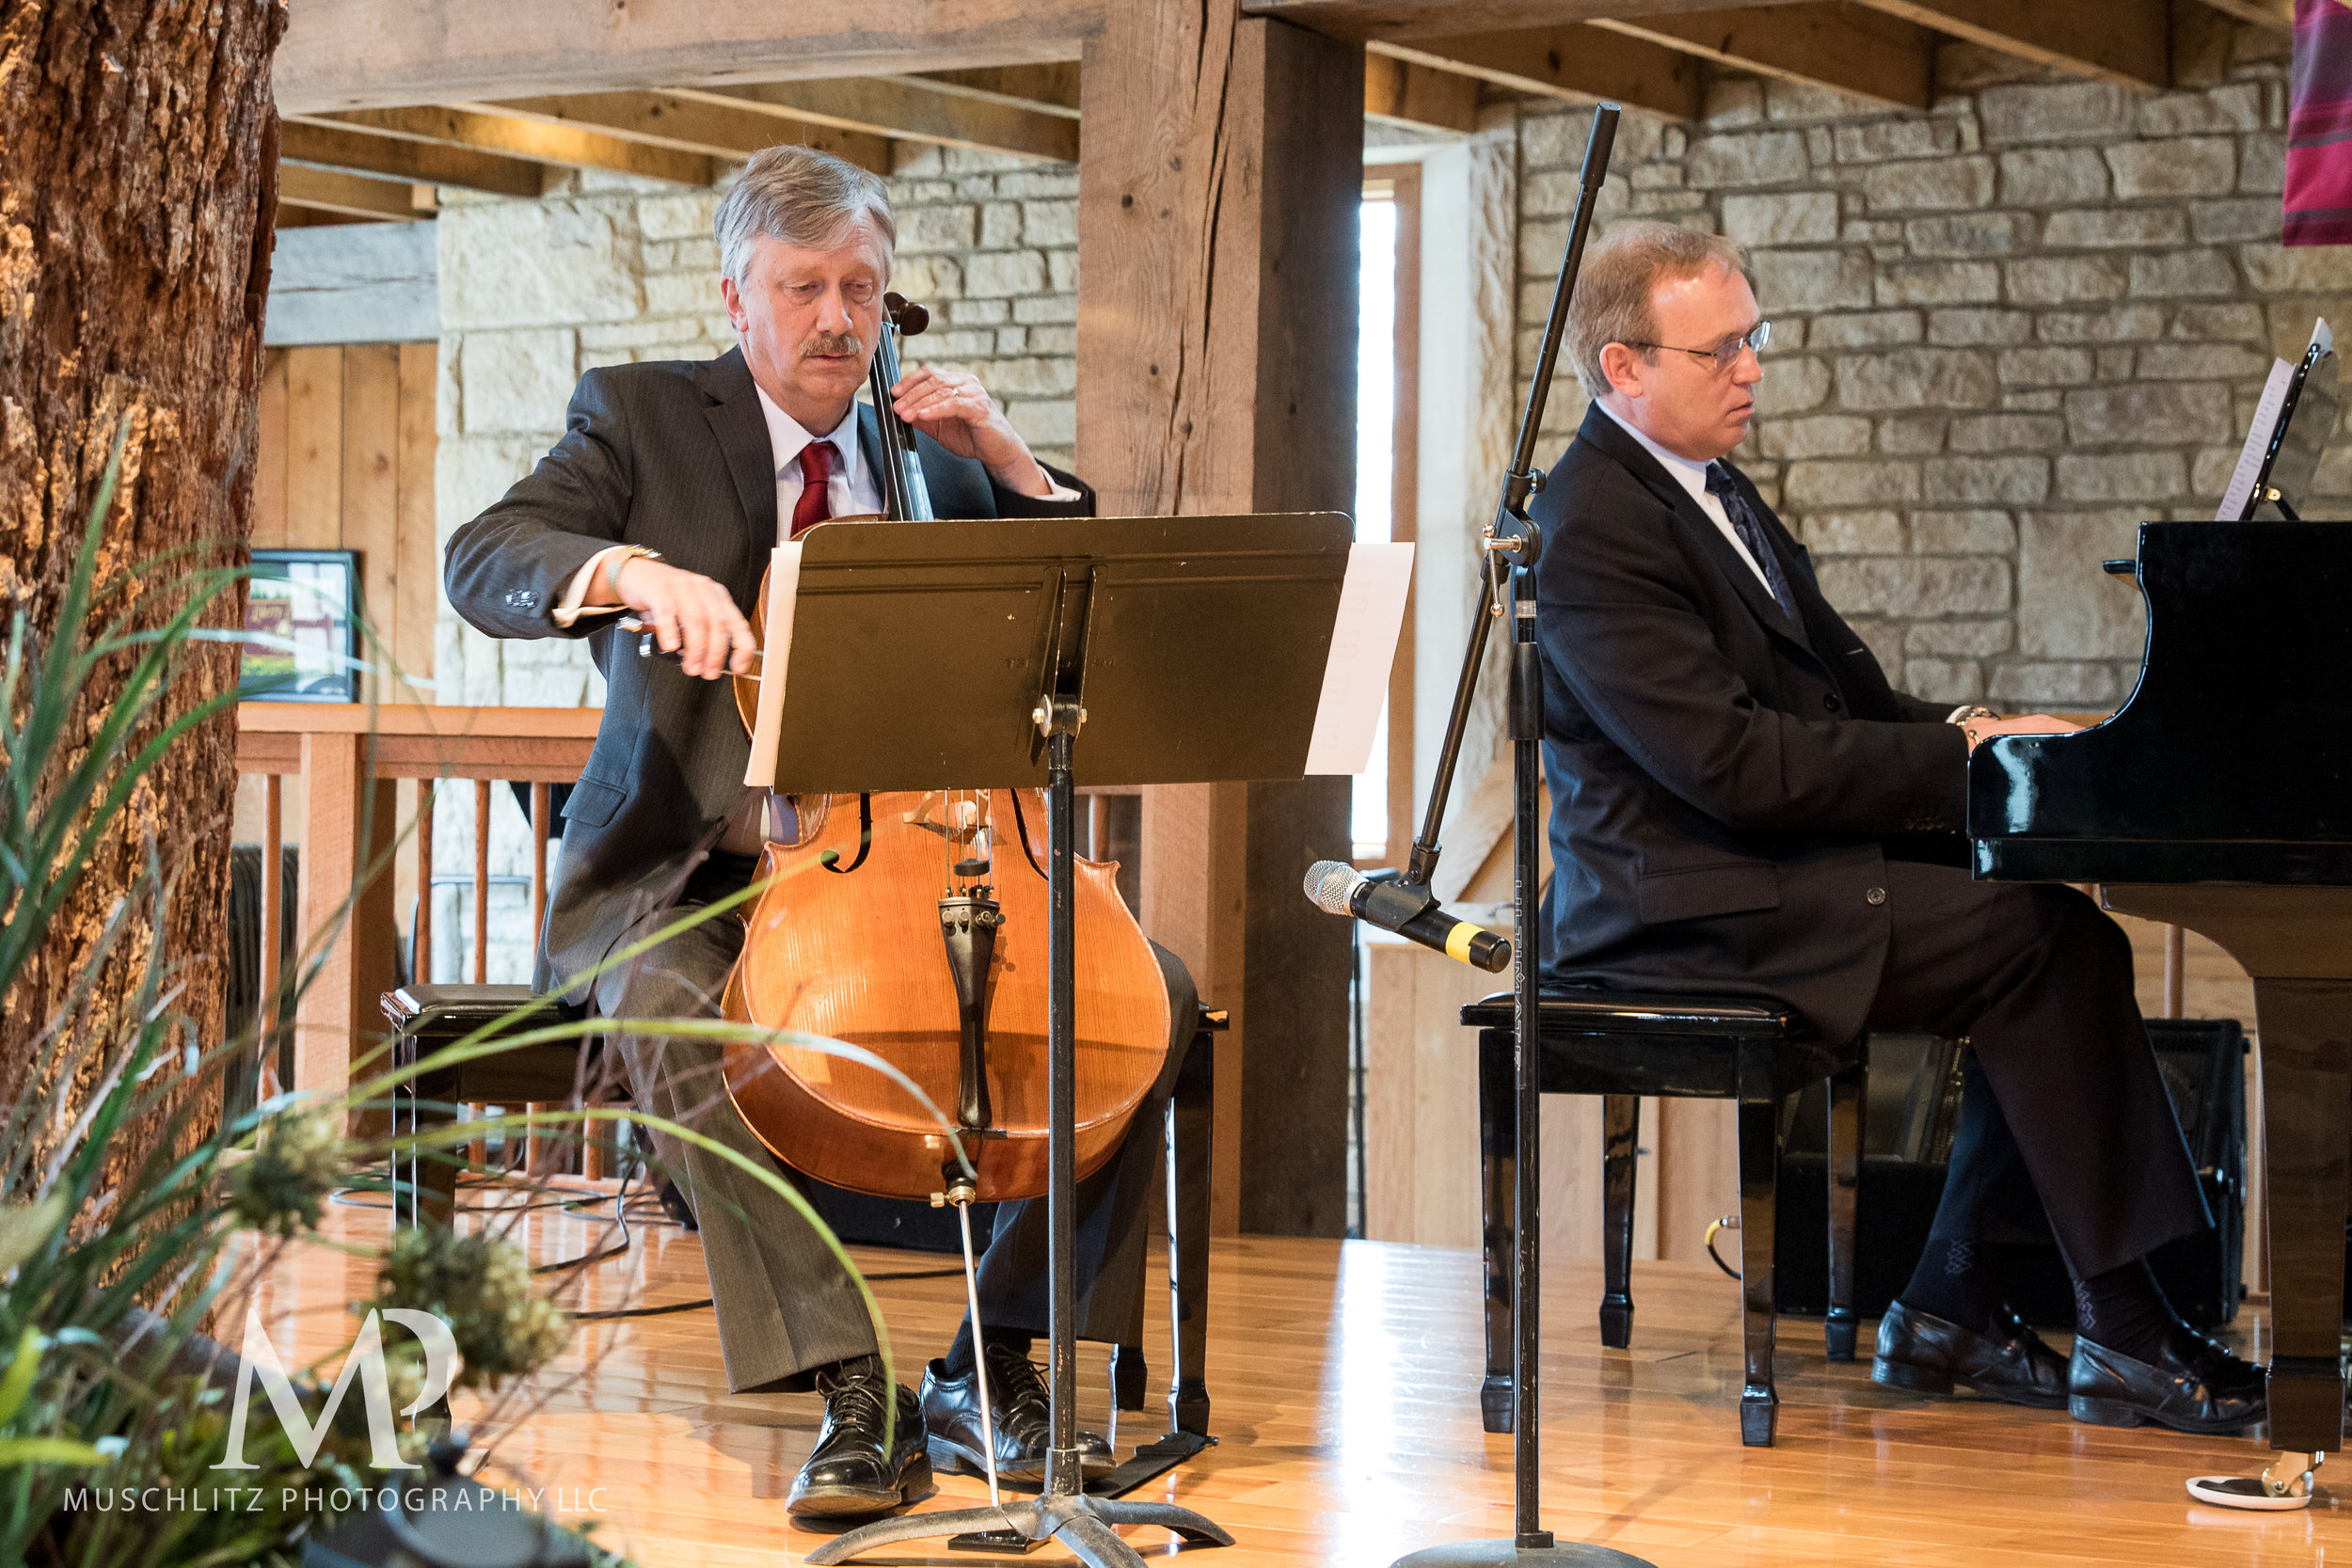 liberty-barn-presbyterian-church-wedding-delaware-columbus-ohio-muschlitz-photography-024.JPG